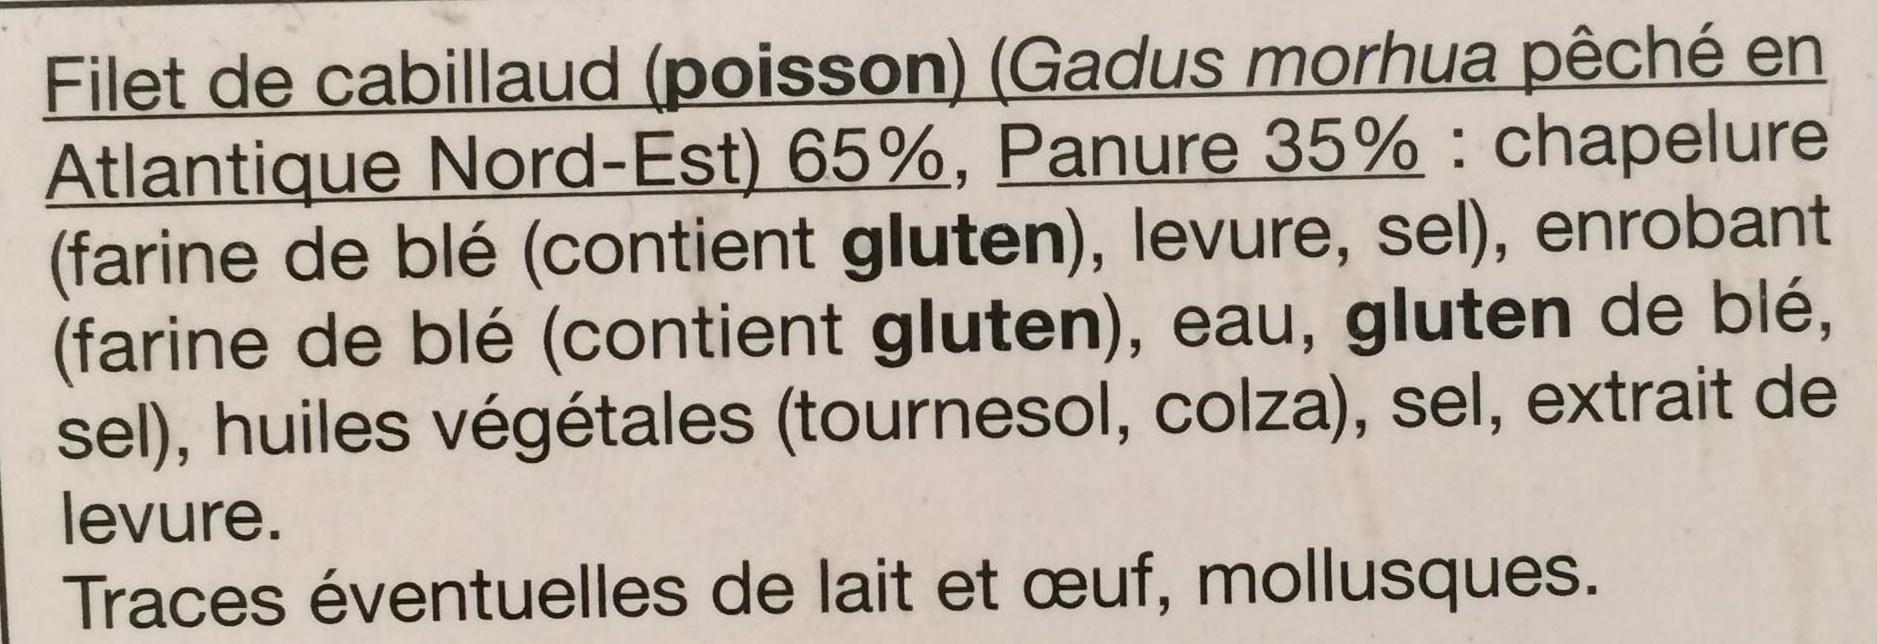 Filets de Cabillaud en panure croustillante - Ingrediënten